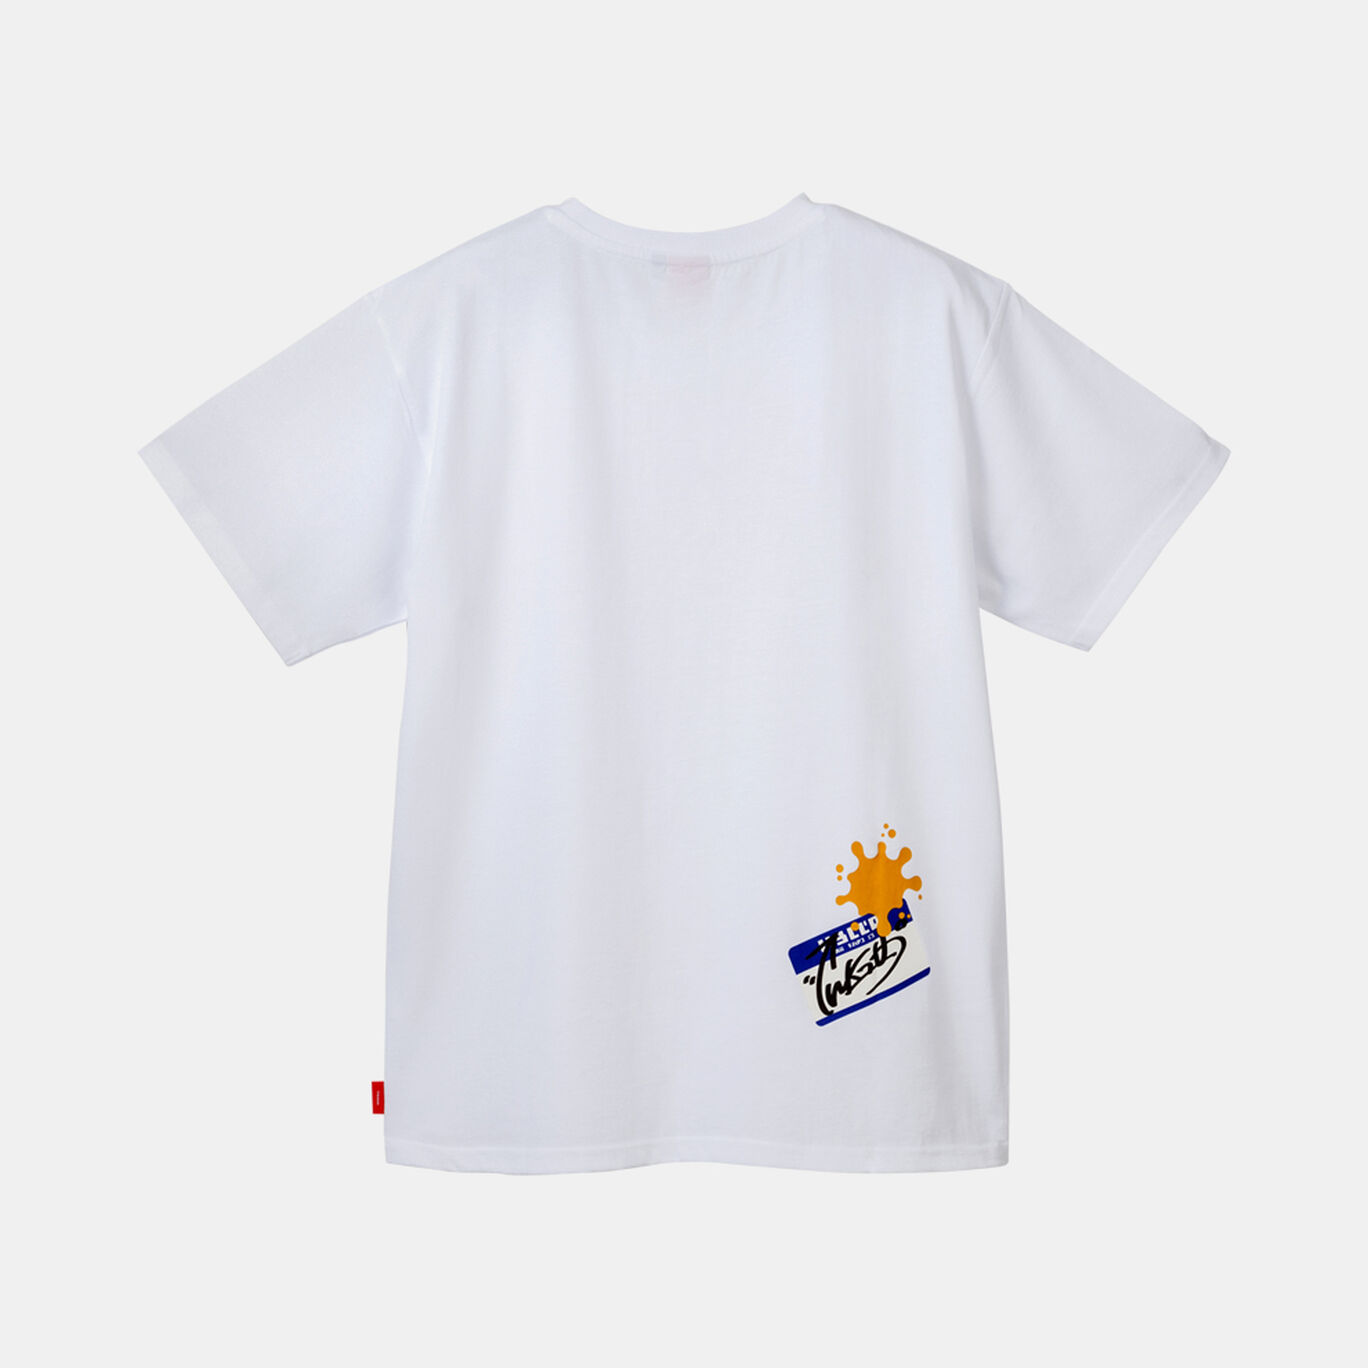 Tシャツ B M INK YOU UP【Nintendo TOKYO取り扱い商品】